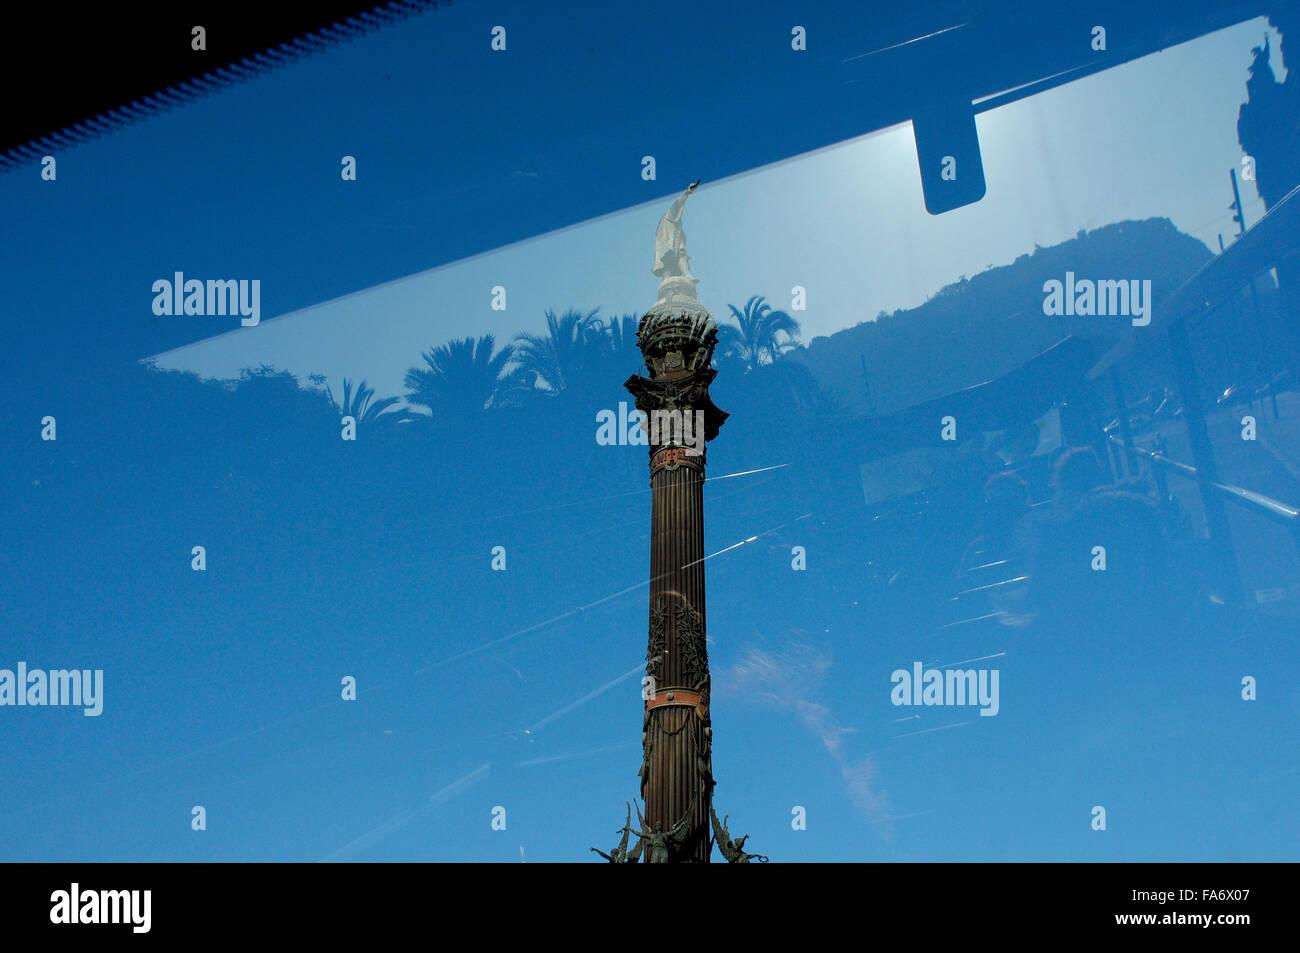 Barcelona Cristobal Colon monument reflexion - Stock Image